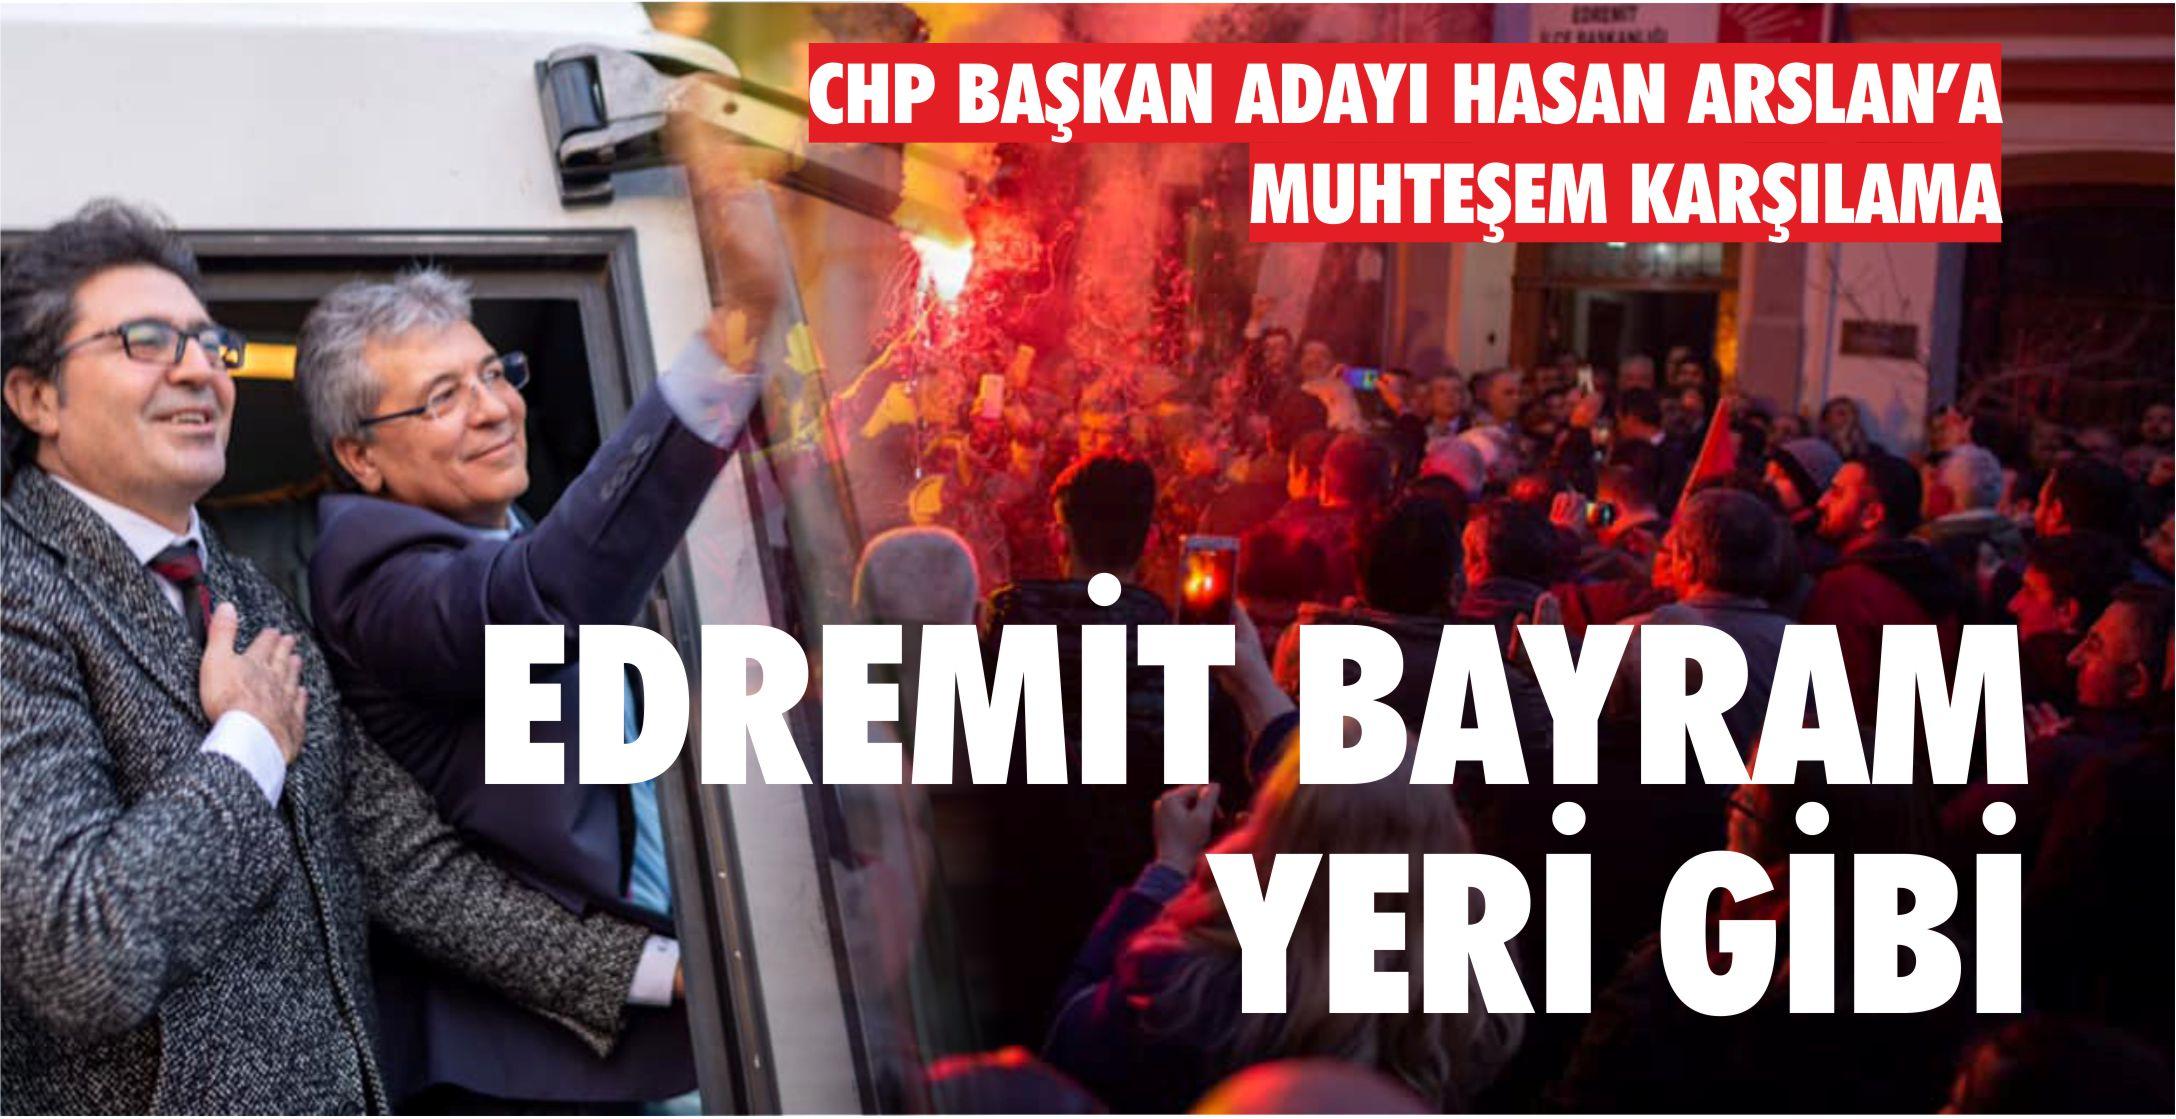 HASAN ARSLAN'A EDREMİT'TE MUHTEŞEM KARŞILAMA